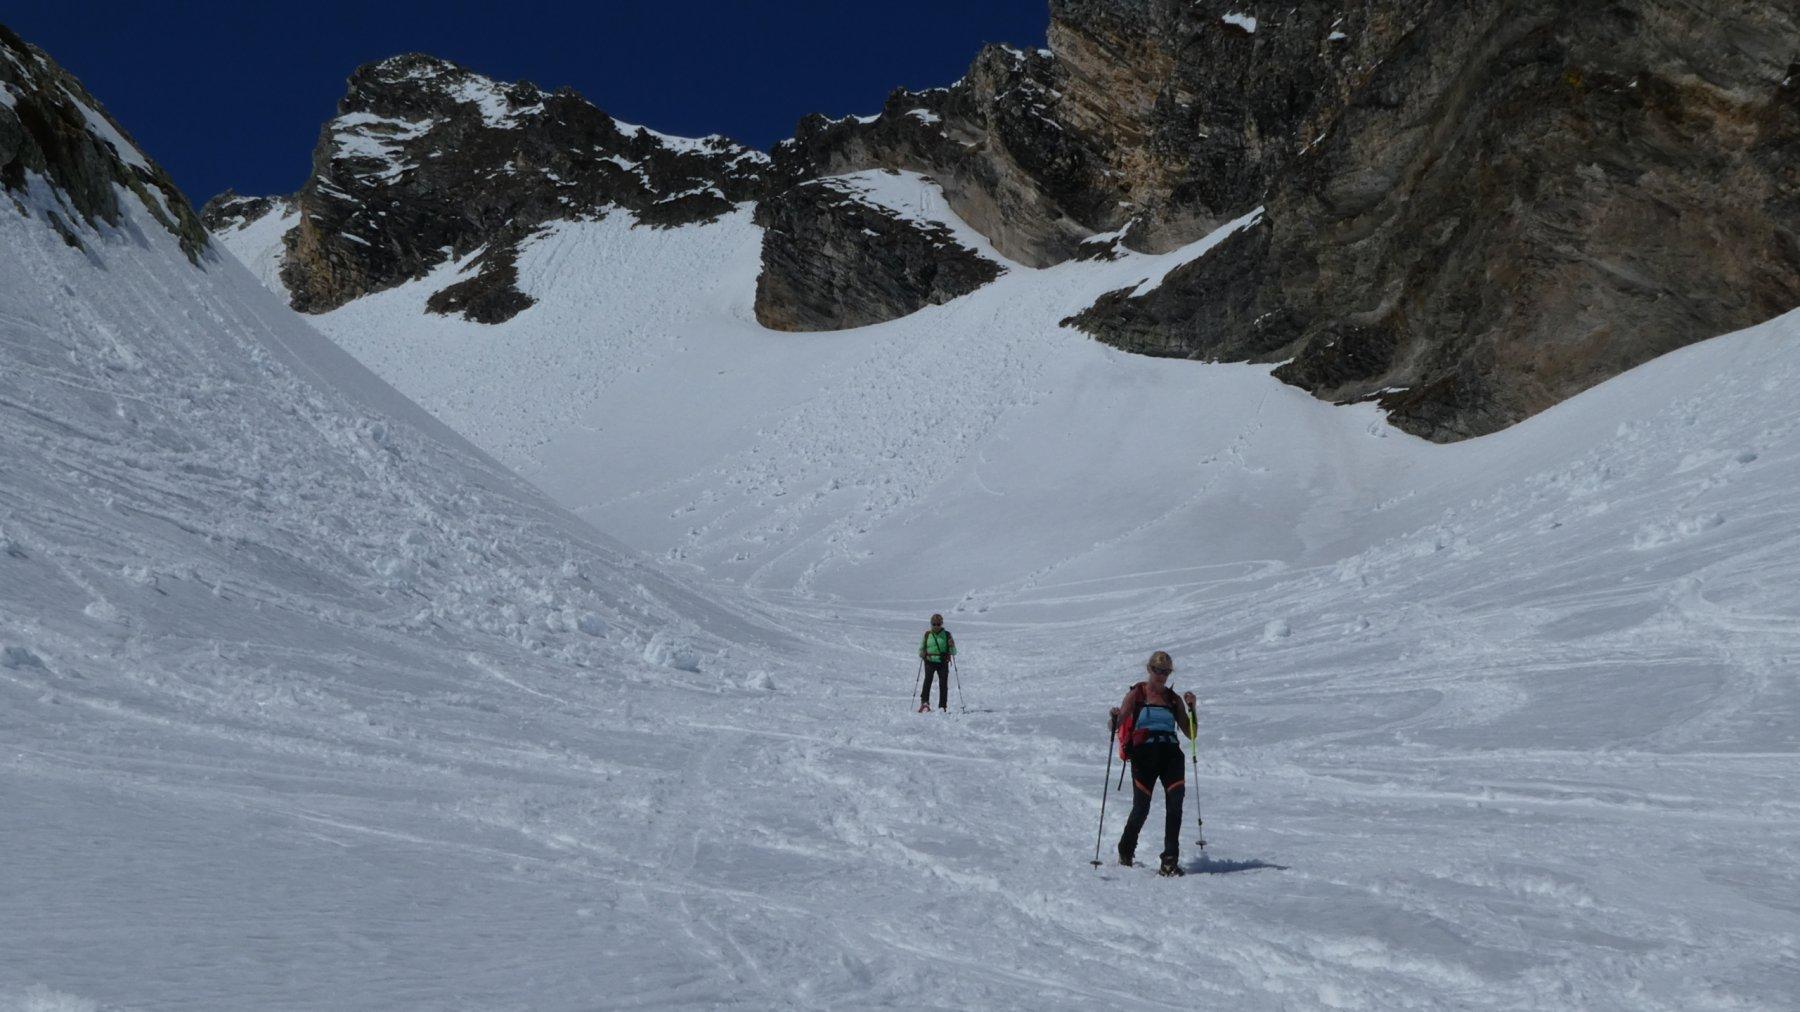 Laura e Anna Maria in discesa verso l'alpeggio Montagna Baus